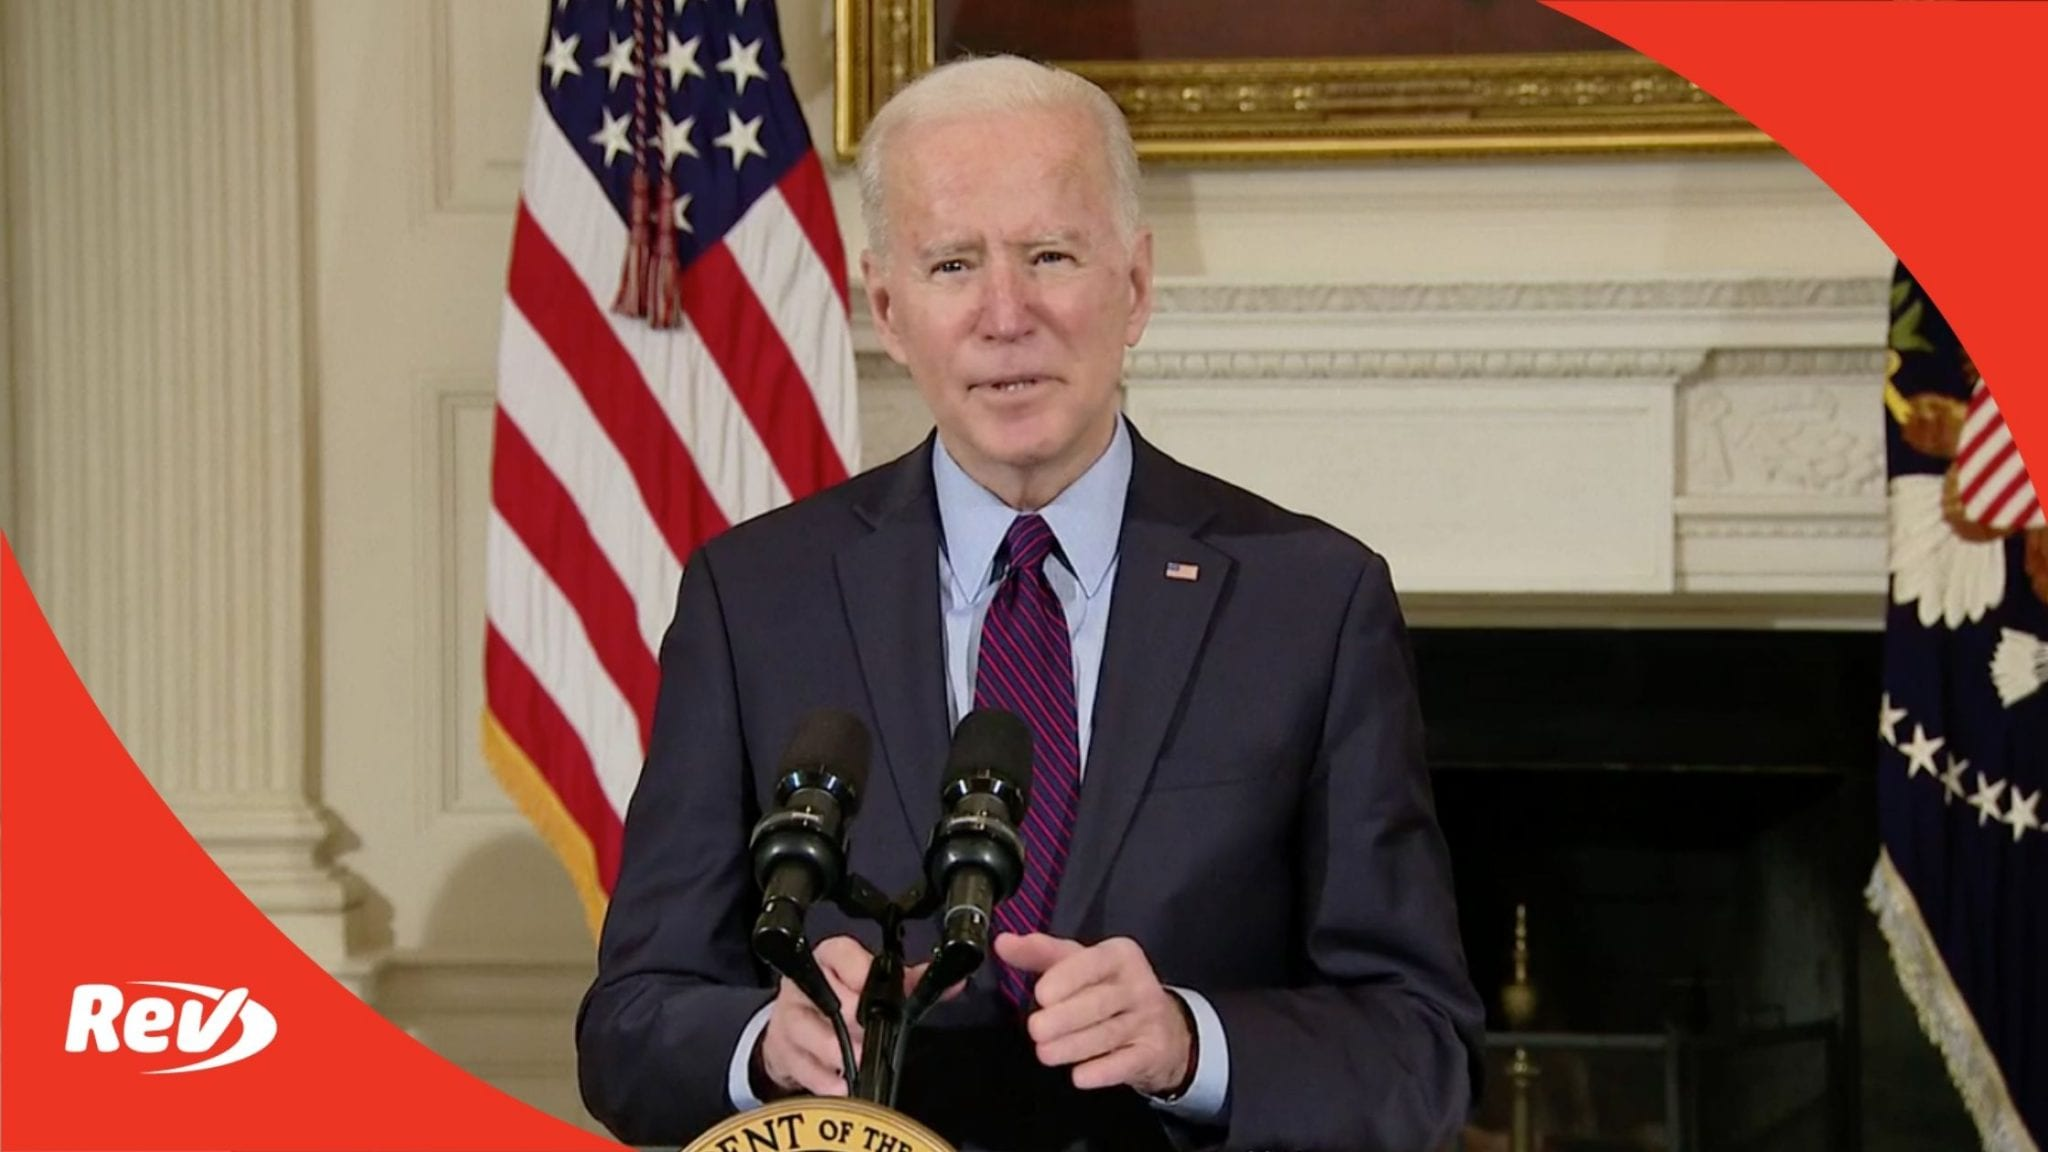 Joe Biden Speech on Economy & COVID-19 Relief Transcript February 5